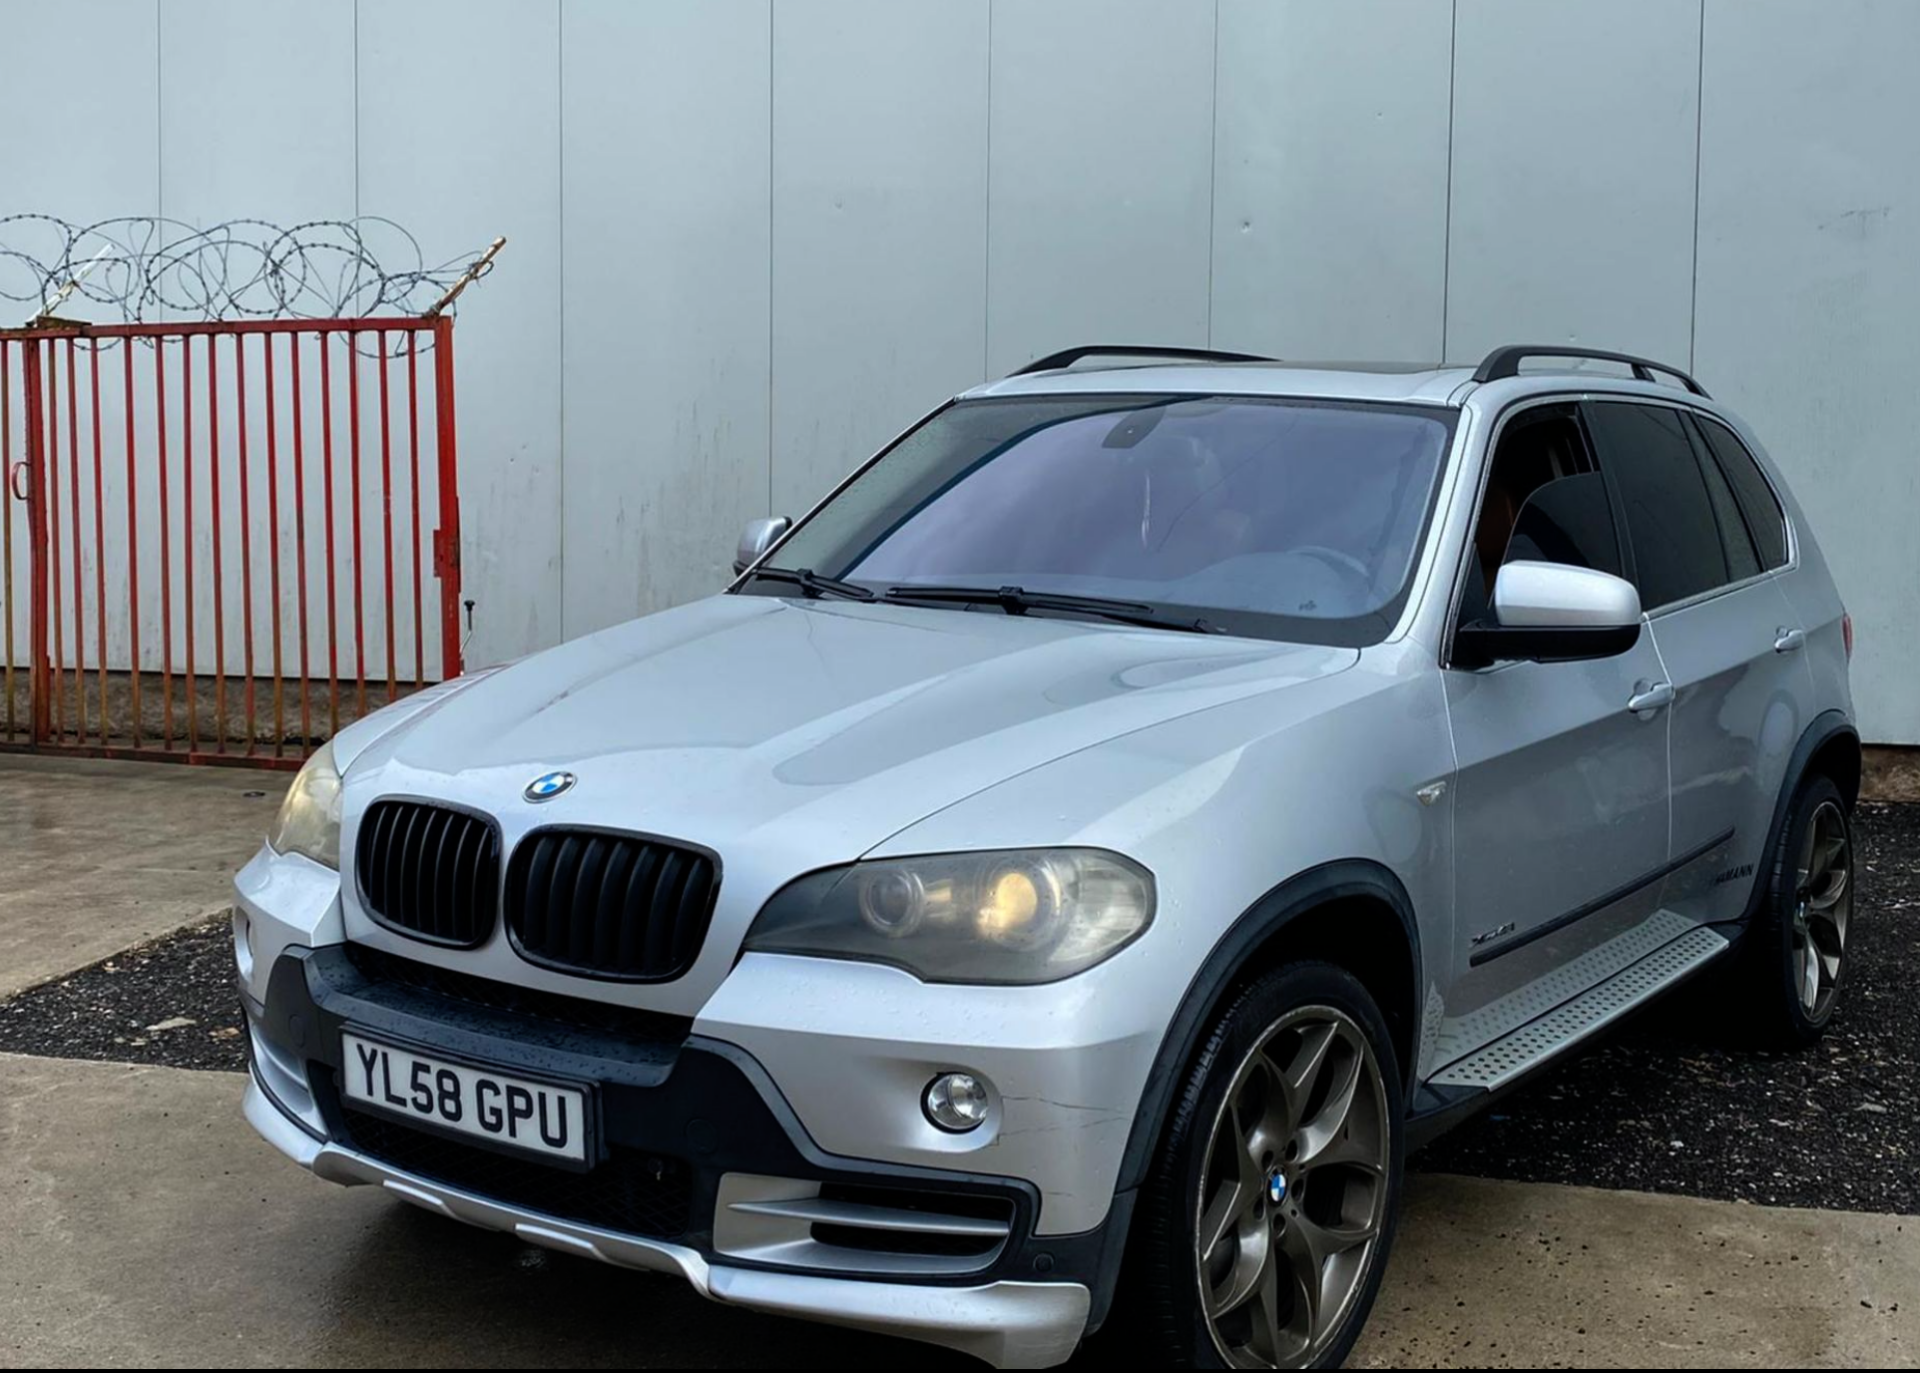 Lot 45 - 2009/58 REG BMW X5 4.8L PETROL AUTOMATIC SILVER, SHOWING 1 FORMER KEEPER - LEFT HAND DRIVE *NO VAT*